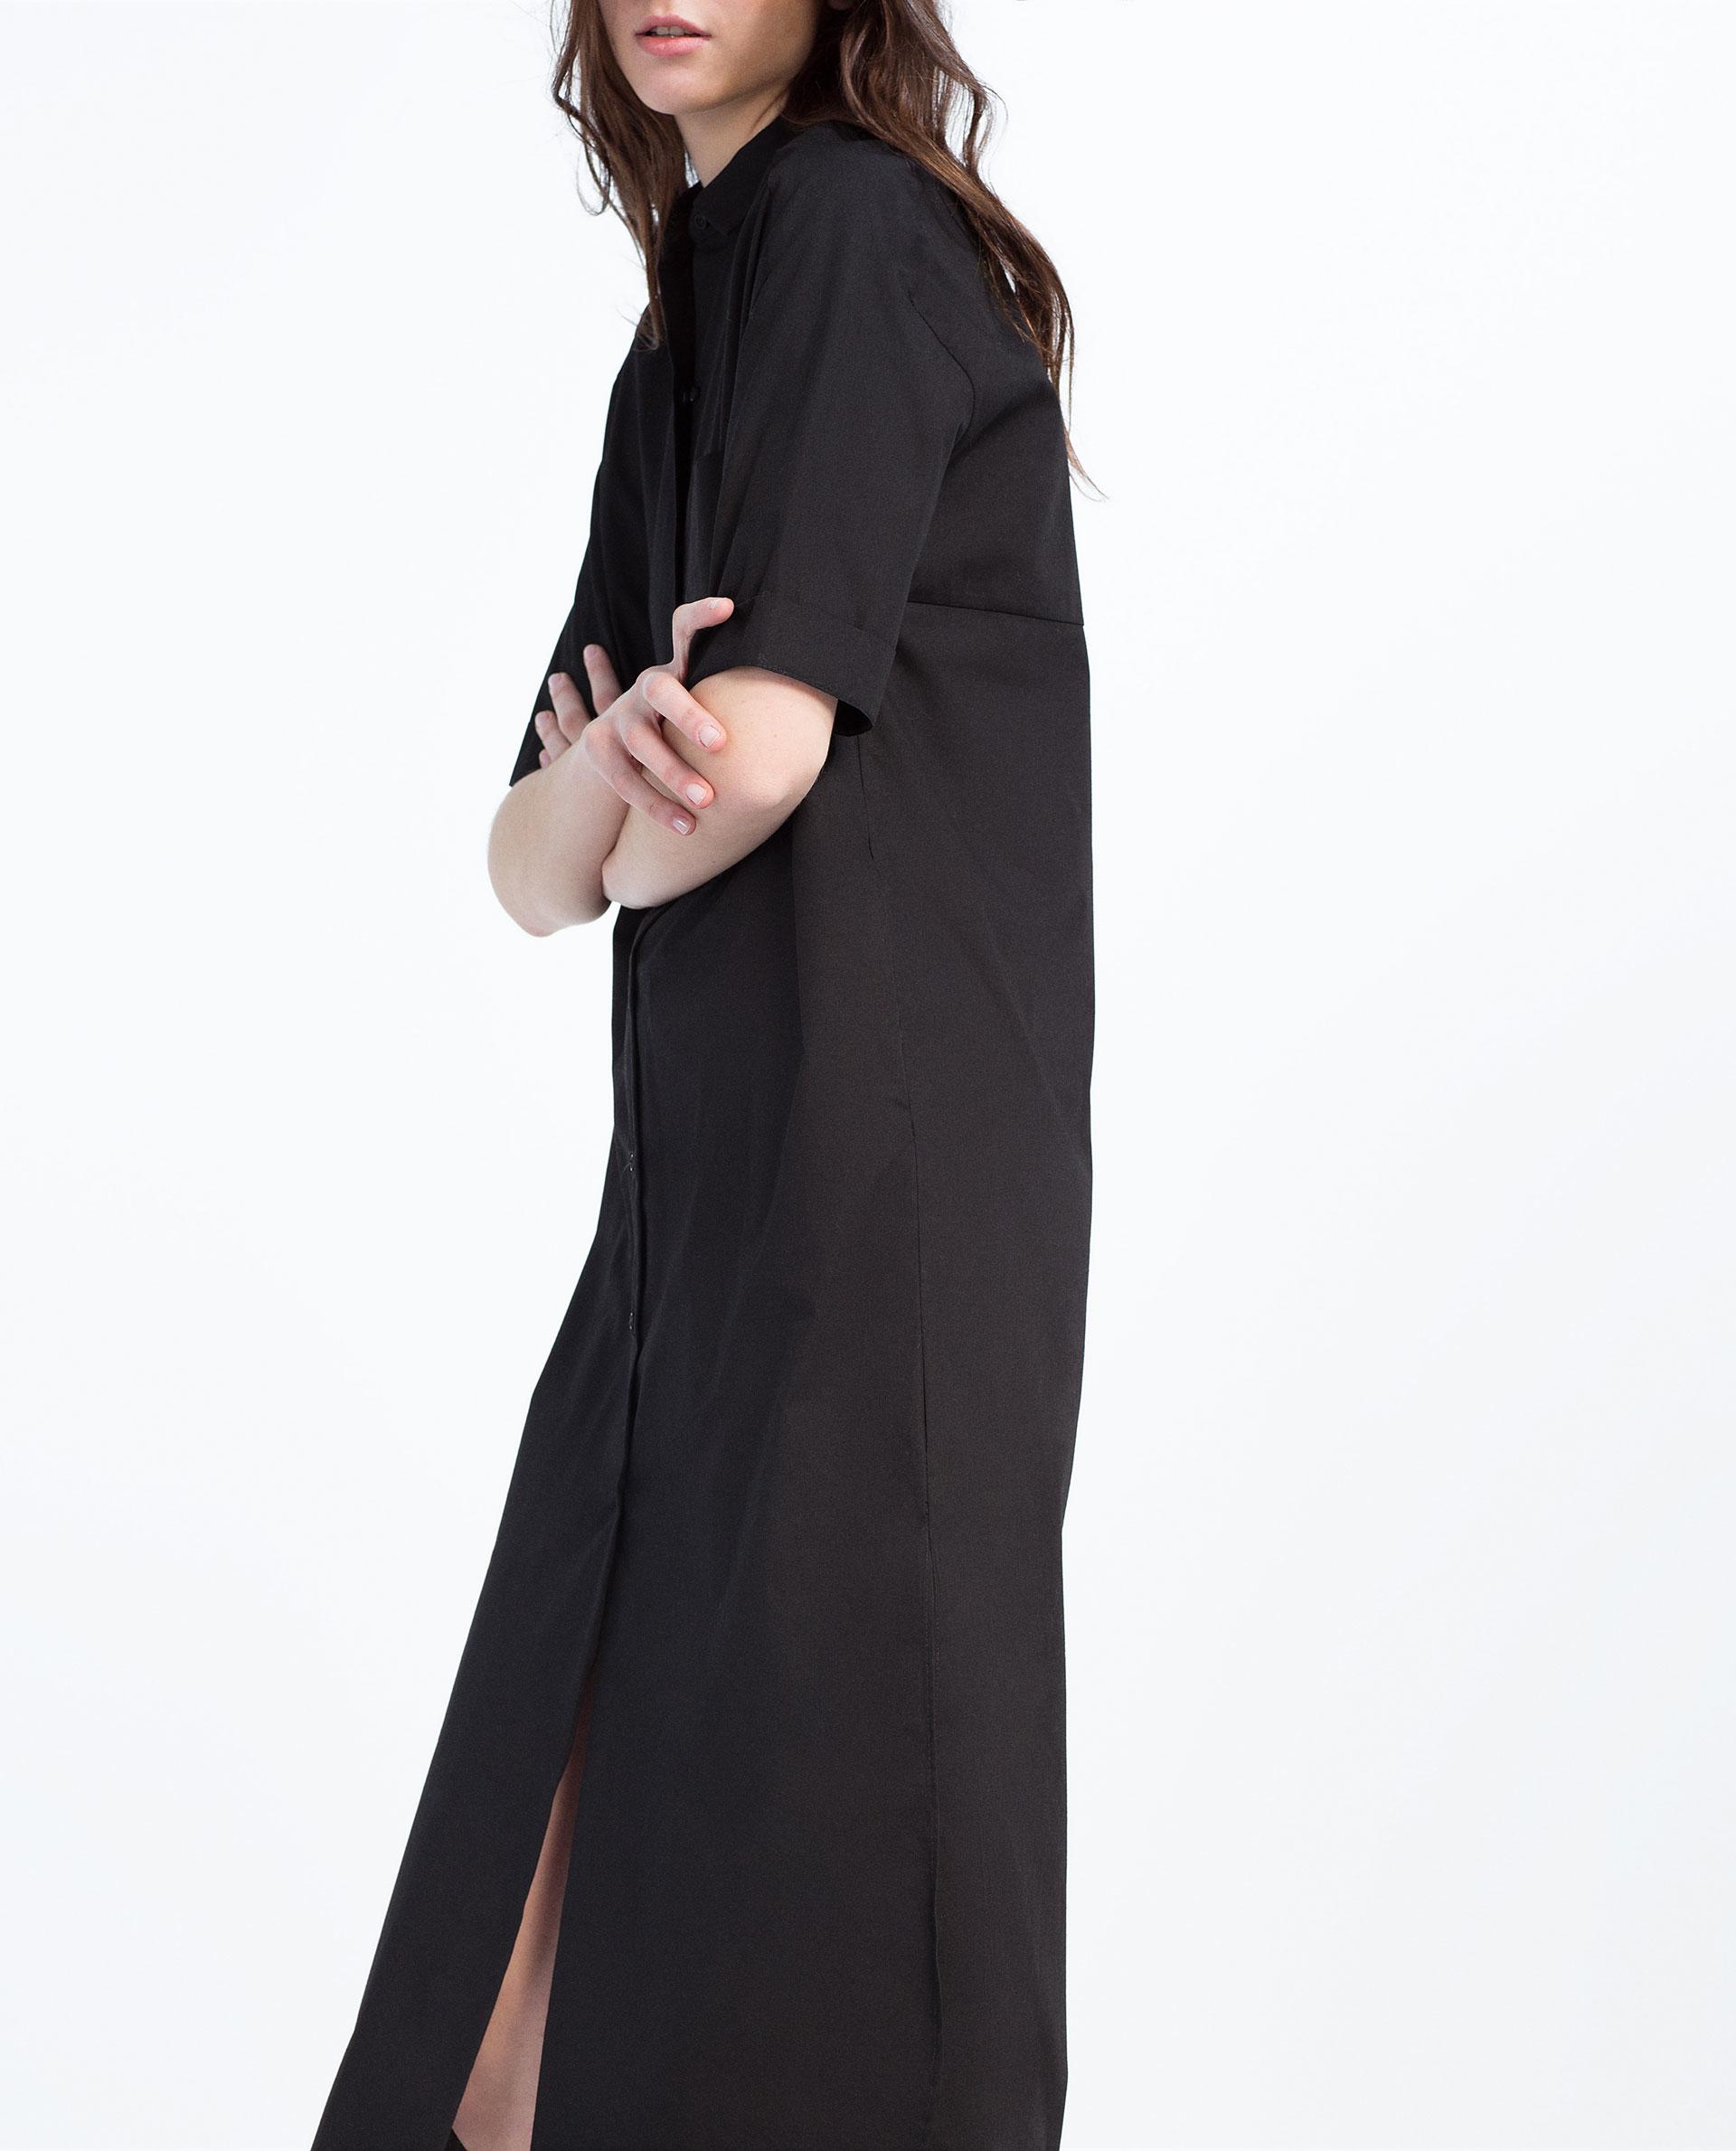 zara extra long shirt dress in black lyst